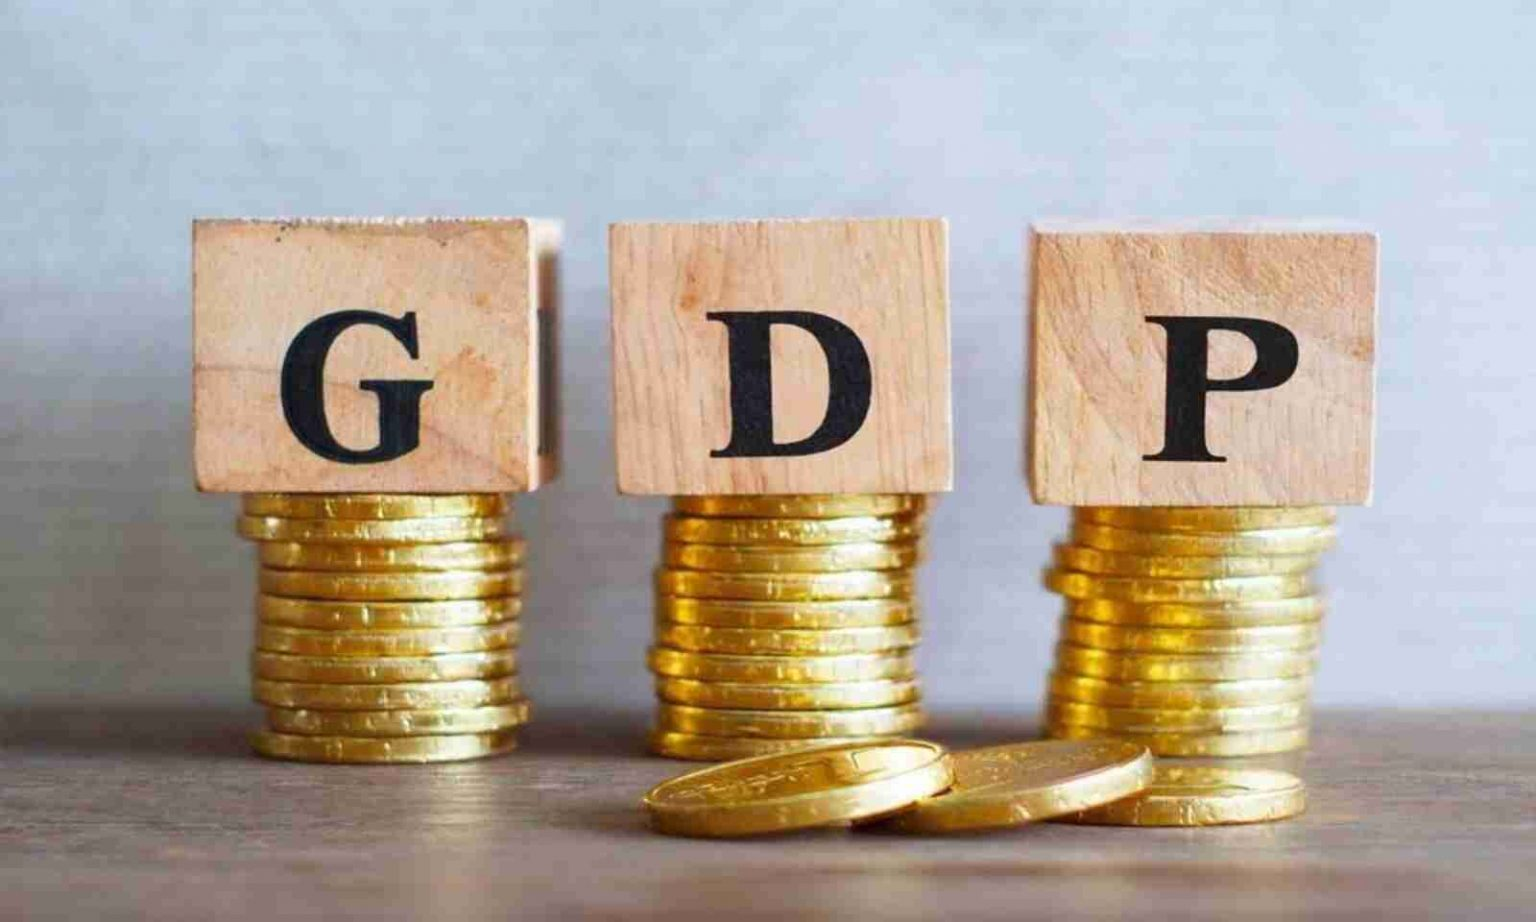 CII projects India's FY22 GDP growth at 9.5%   FY22కి గాను భారతదేశ GDP వృద్ధిని 9.5%గా అంచన వేసిన CII  _40.1